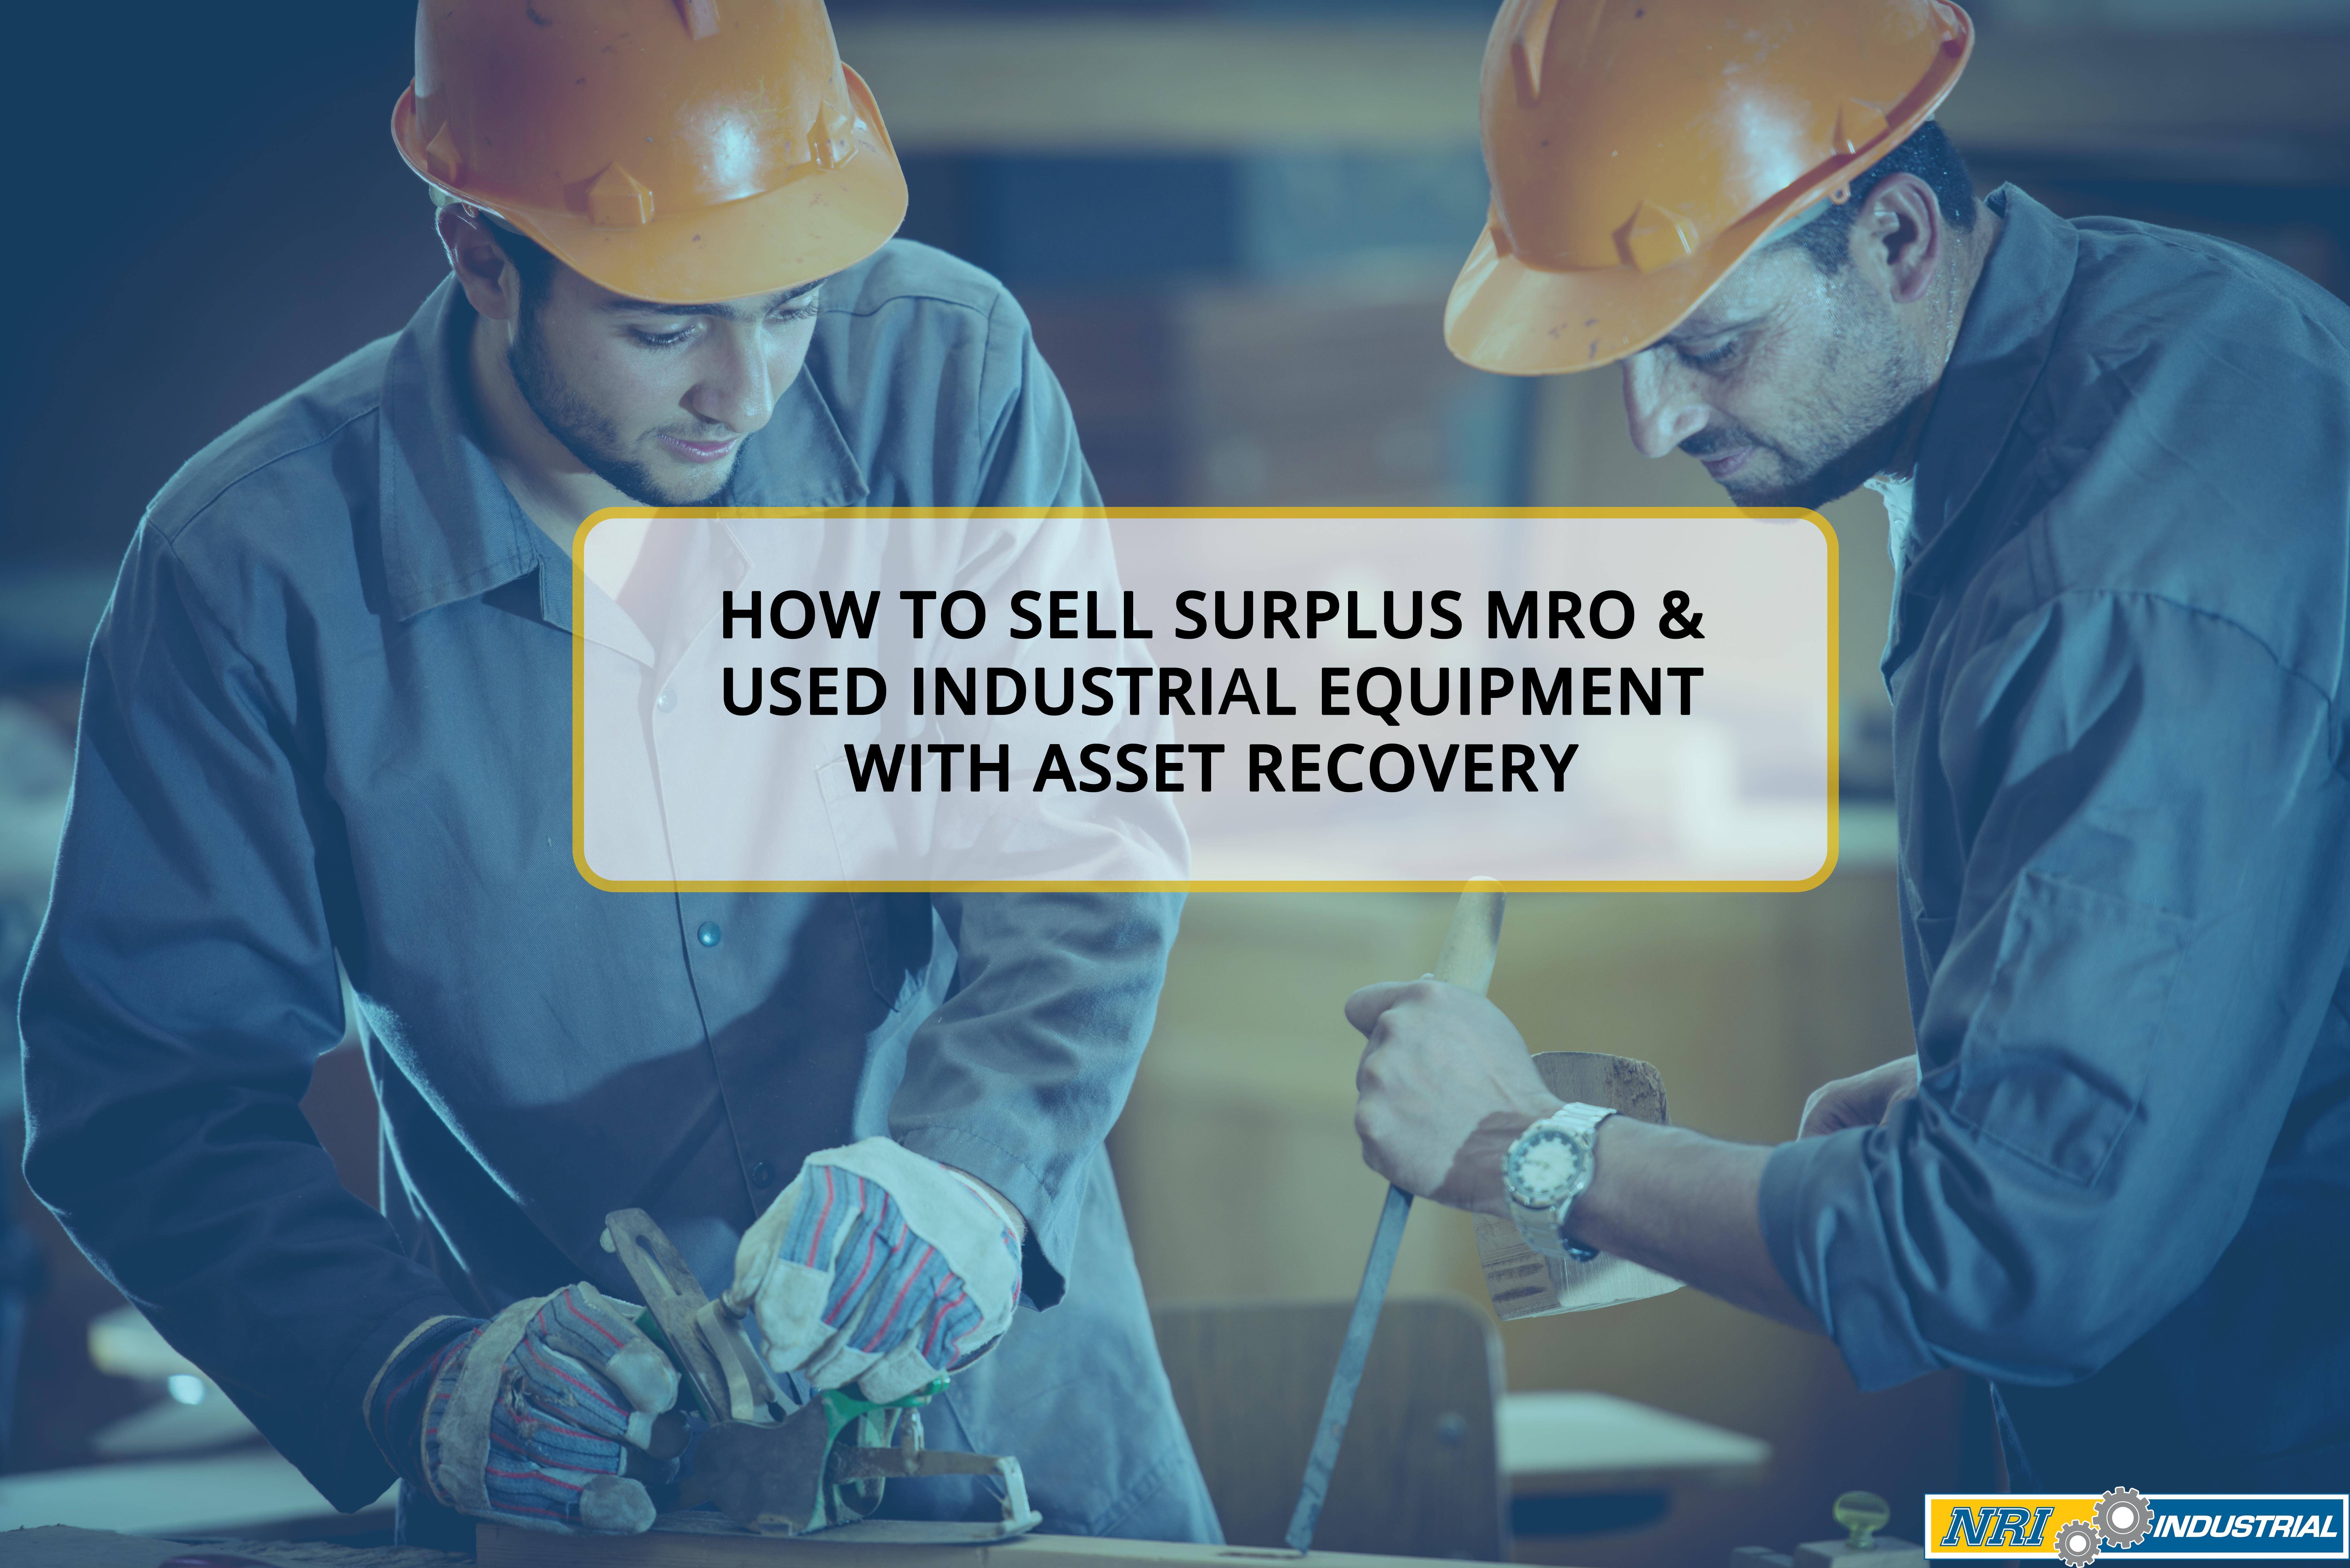 Sell Surplus MRO & Used Industrial Equipment